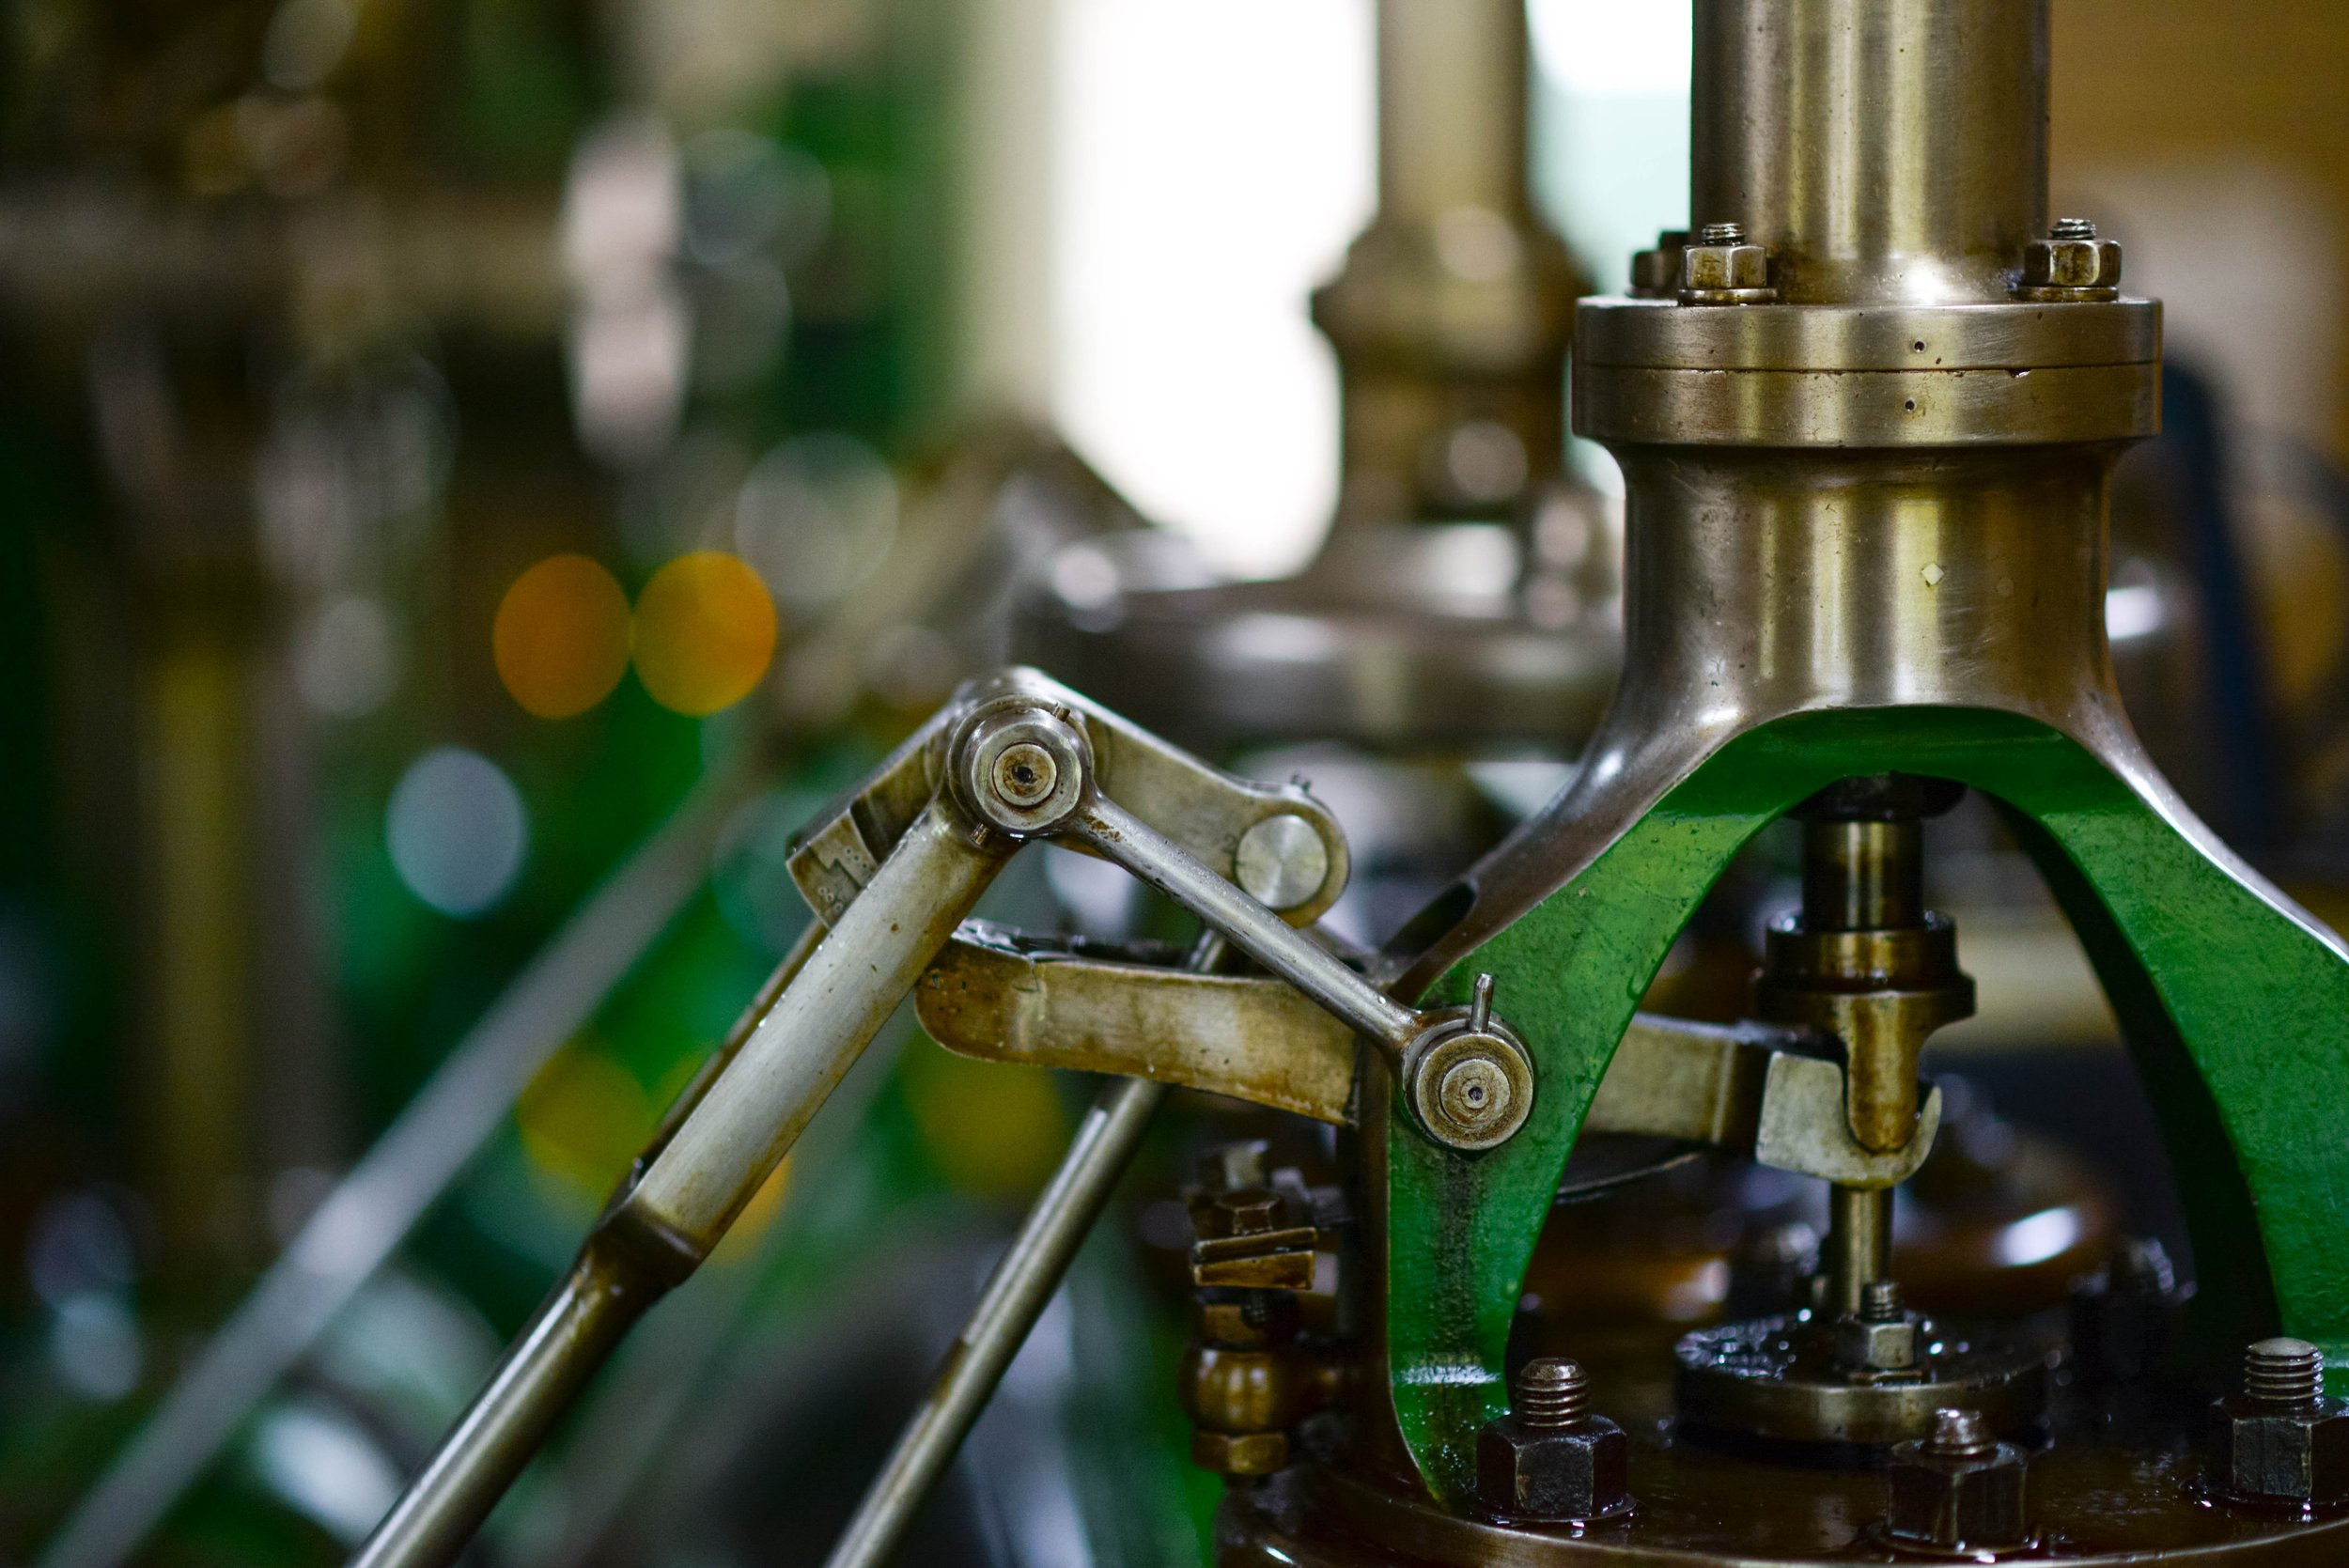 blur-close-up-engineering-633850.jpg